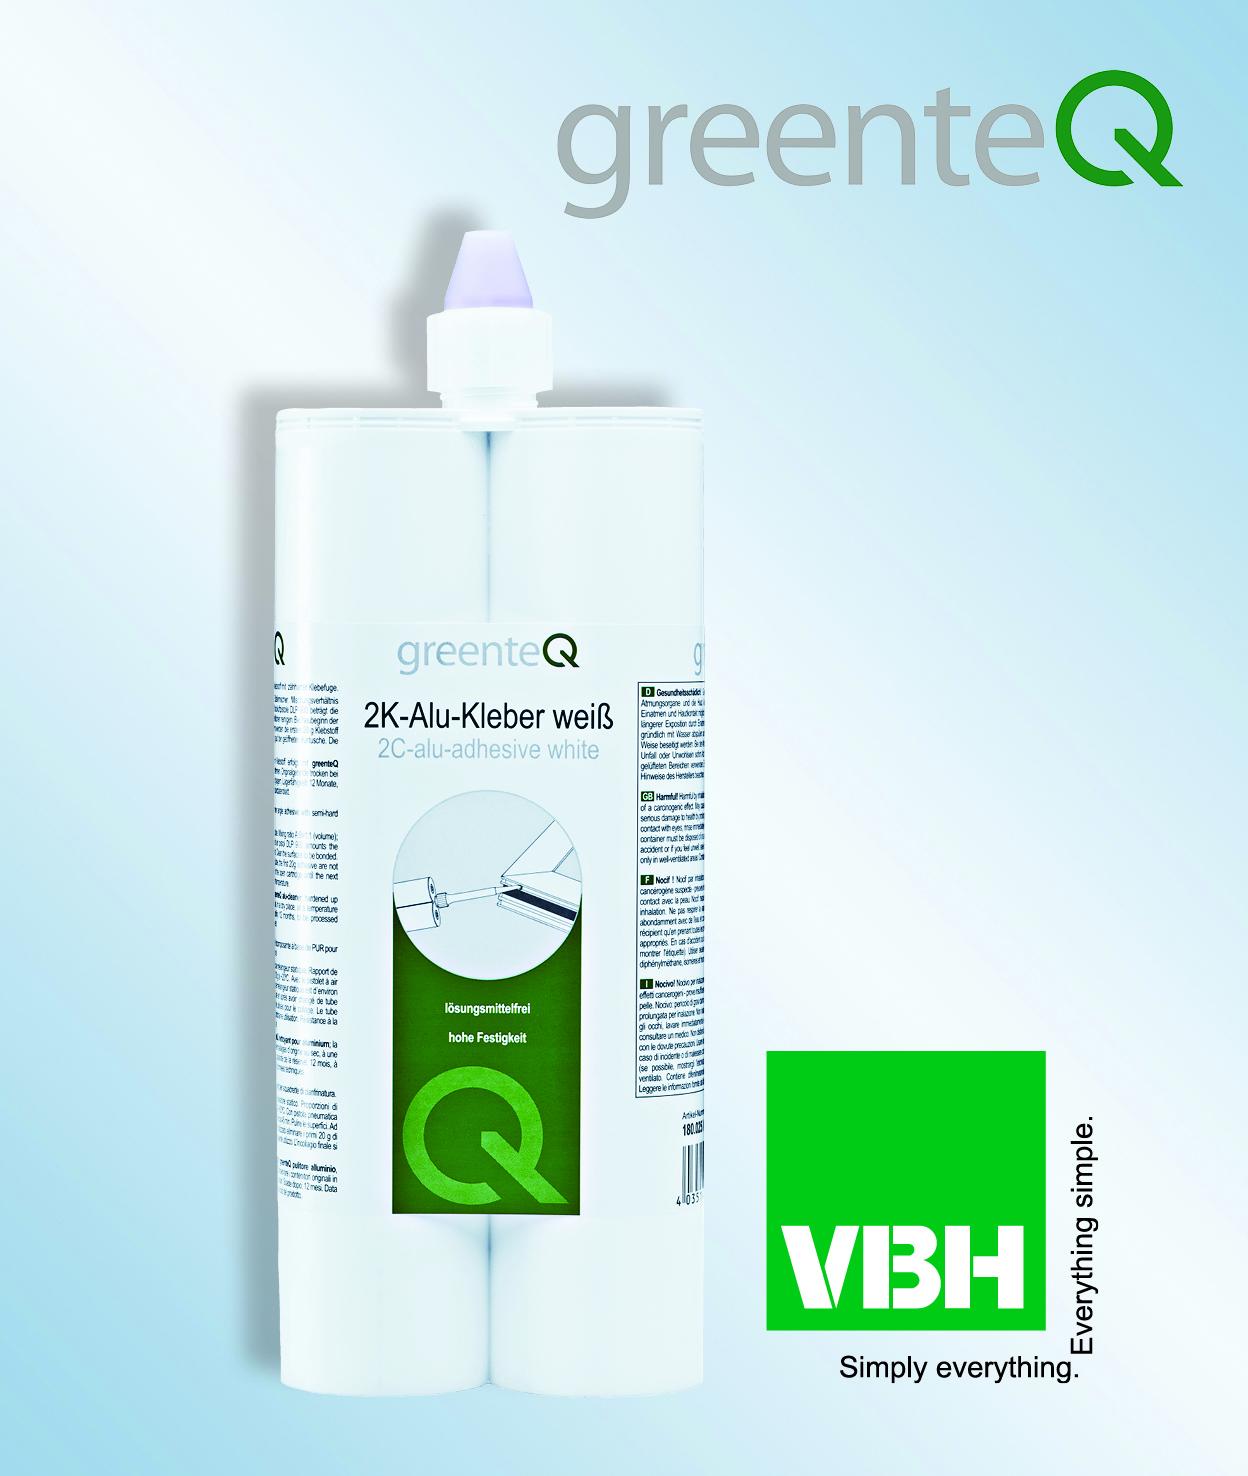 VBH Adds greenteQ Aluminium Adhesive